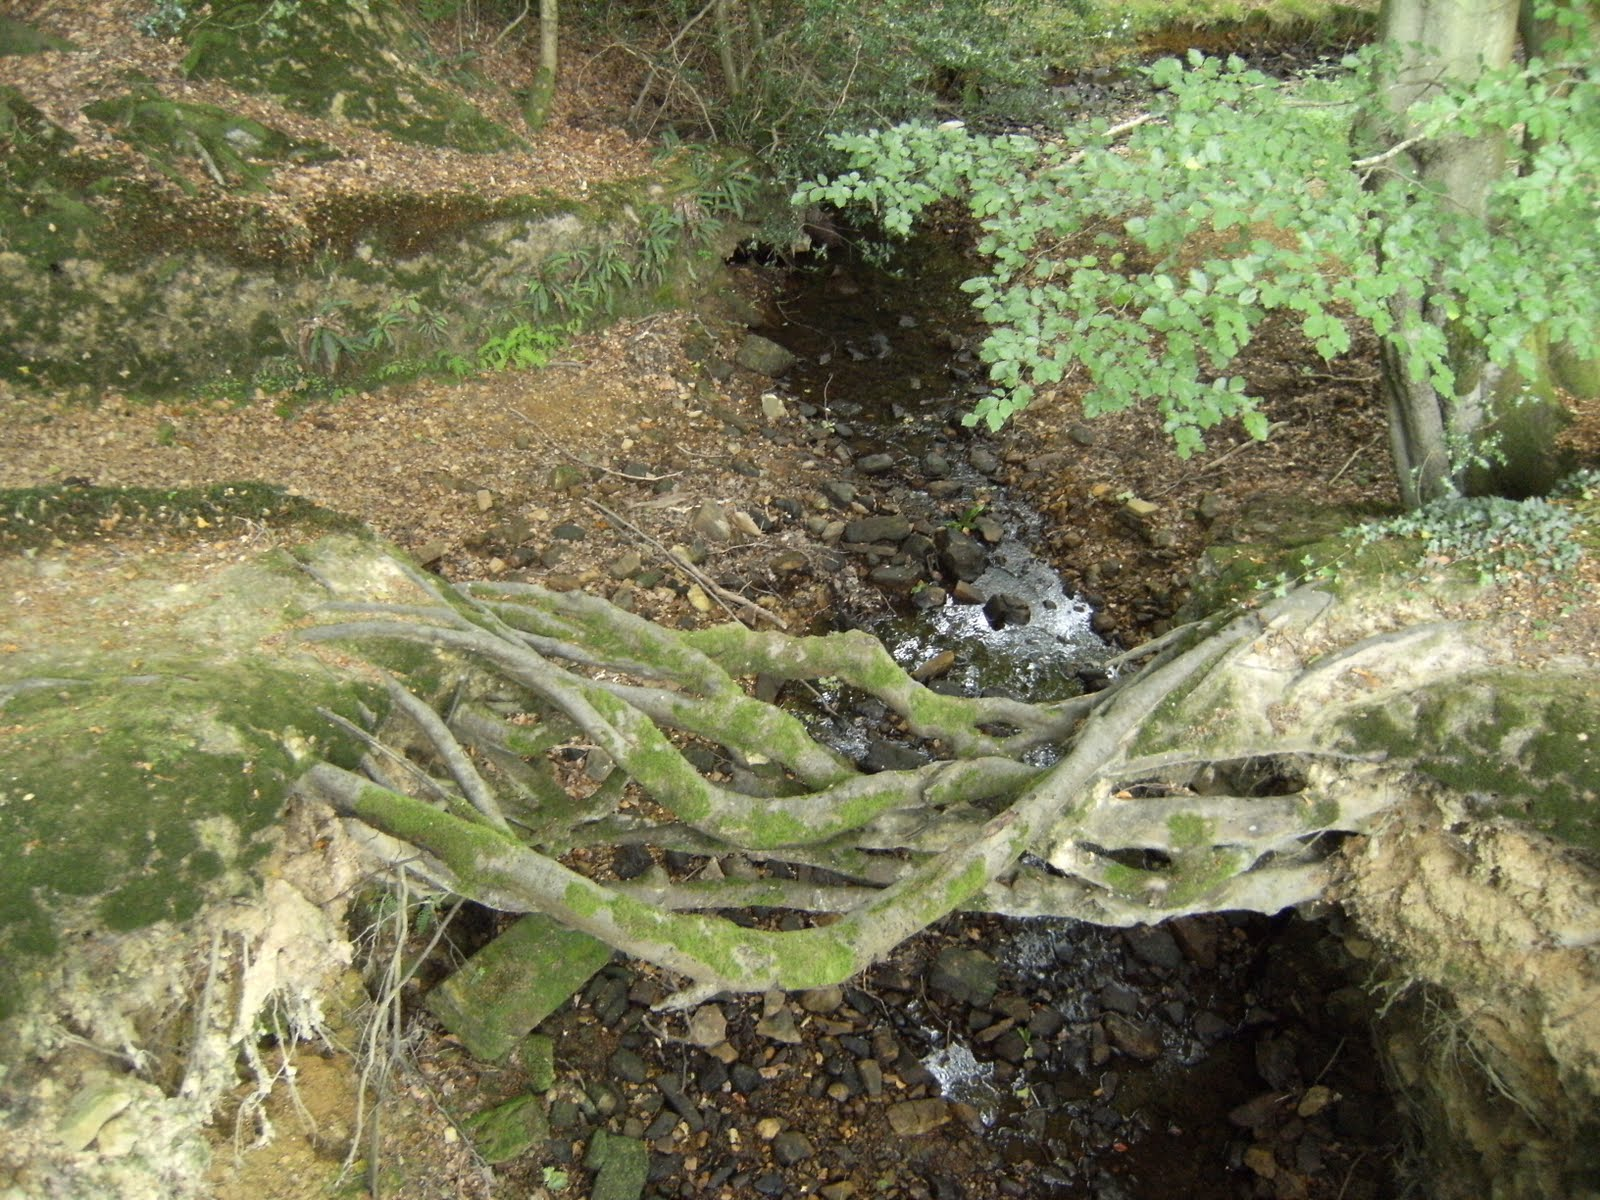 DSCF9306 Tree-root bridge